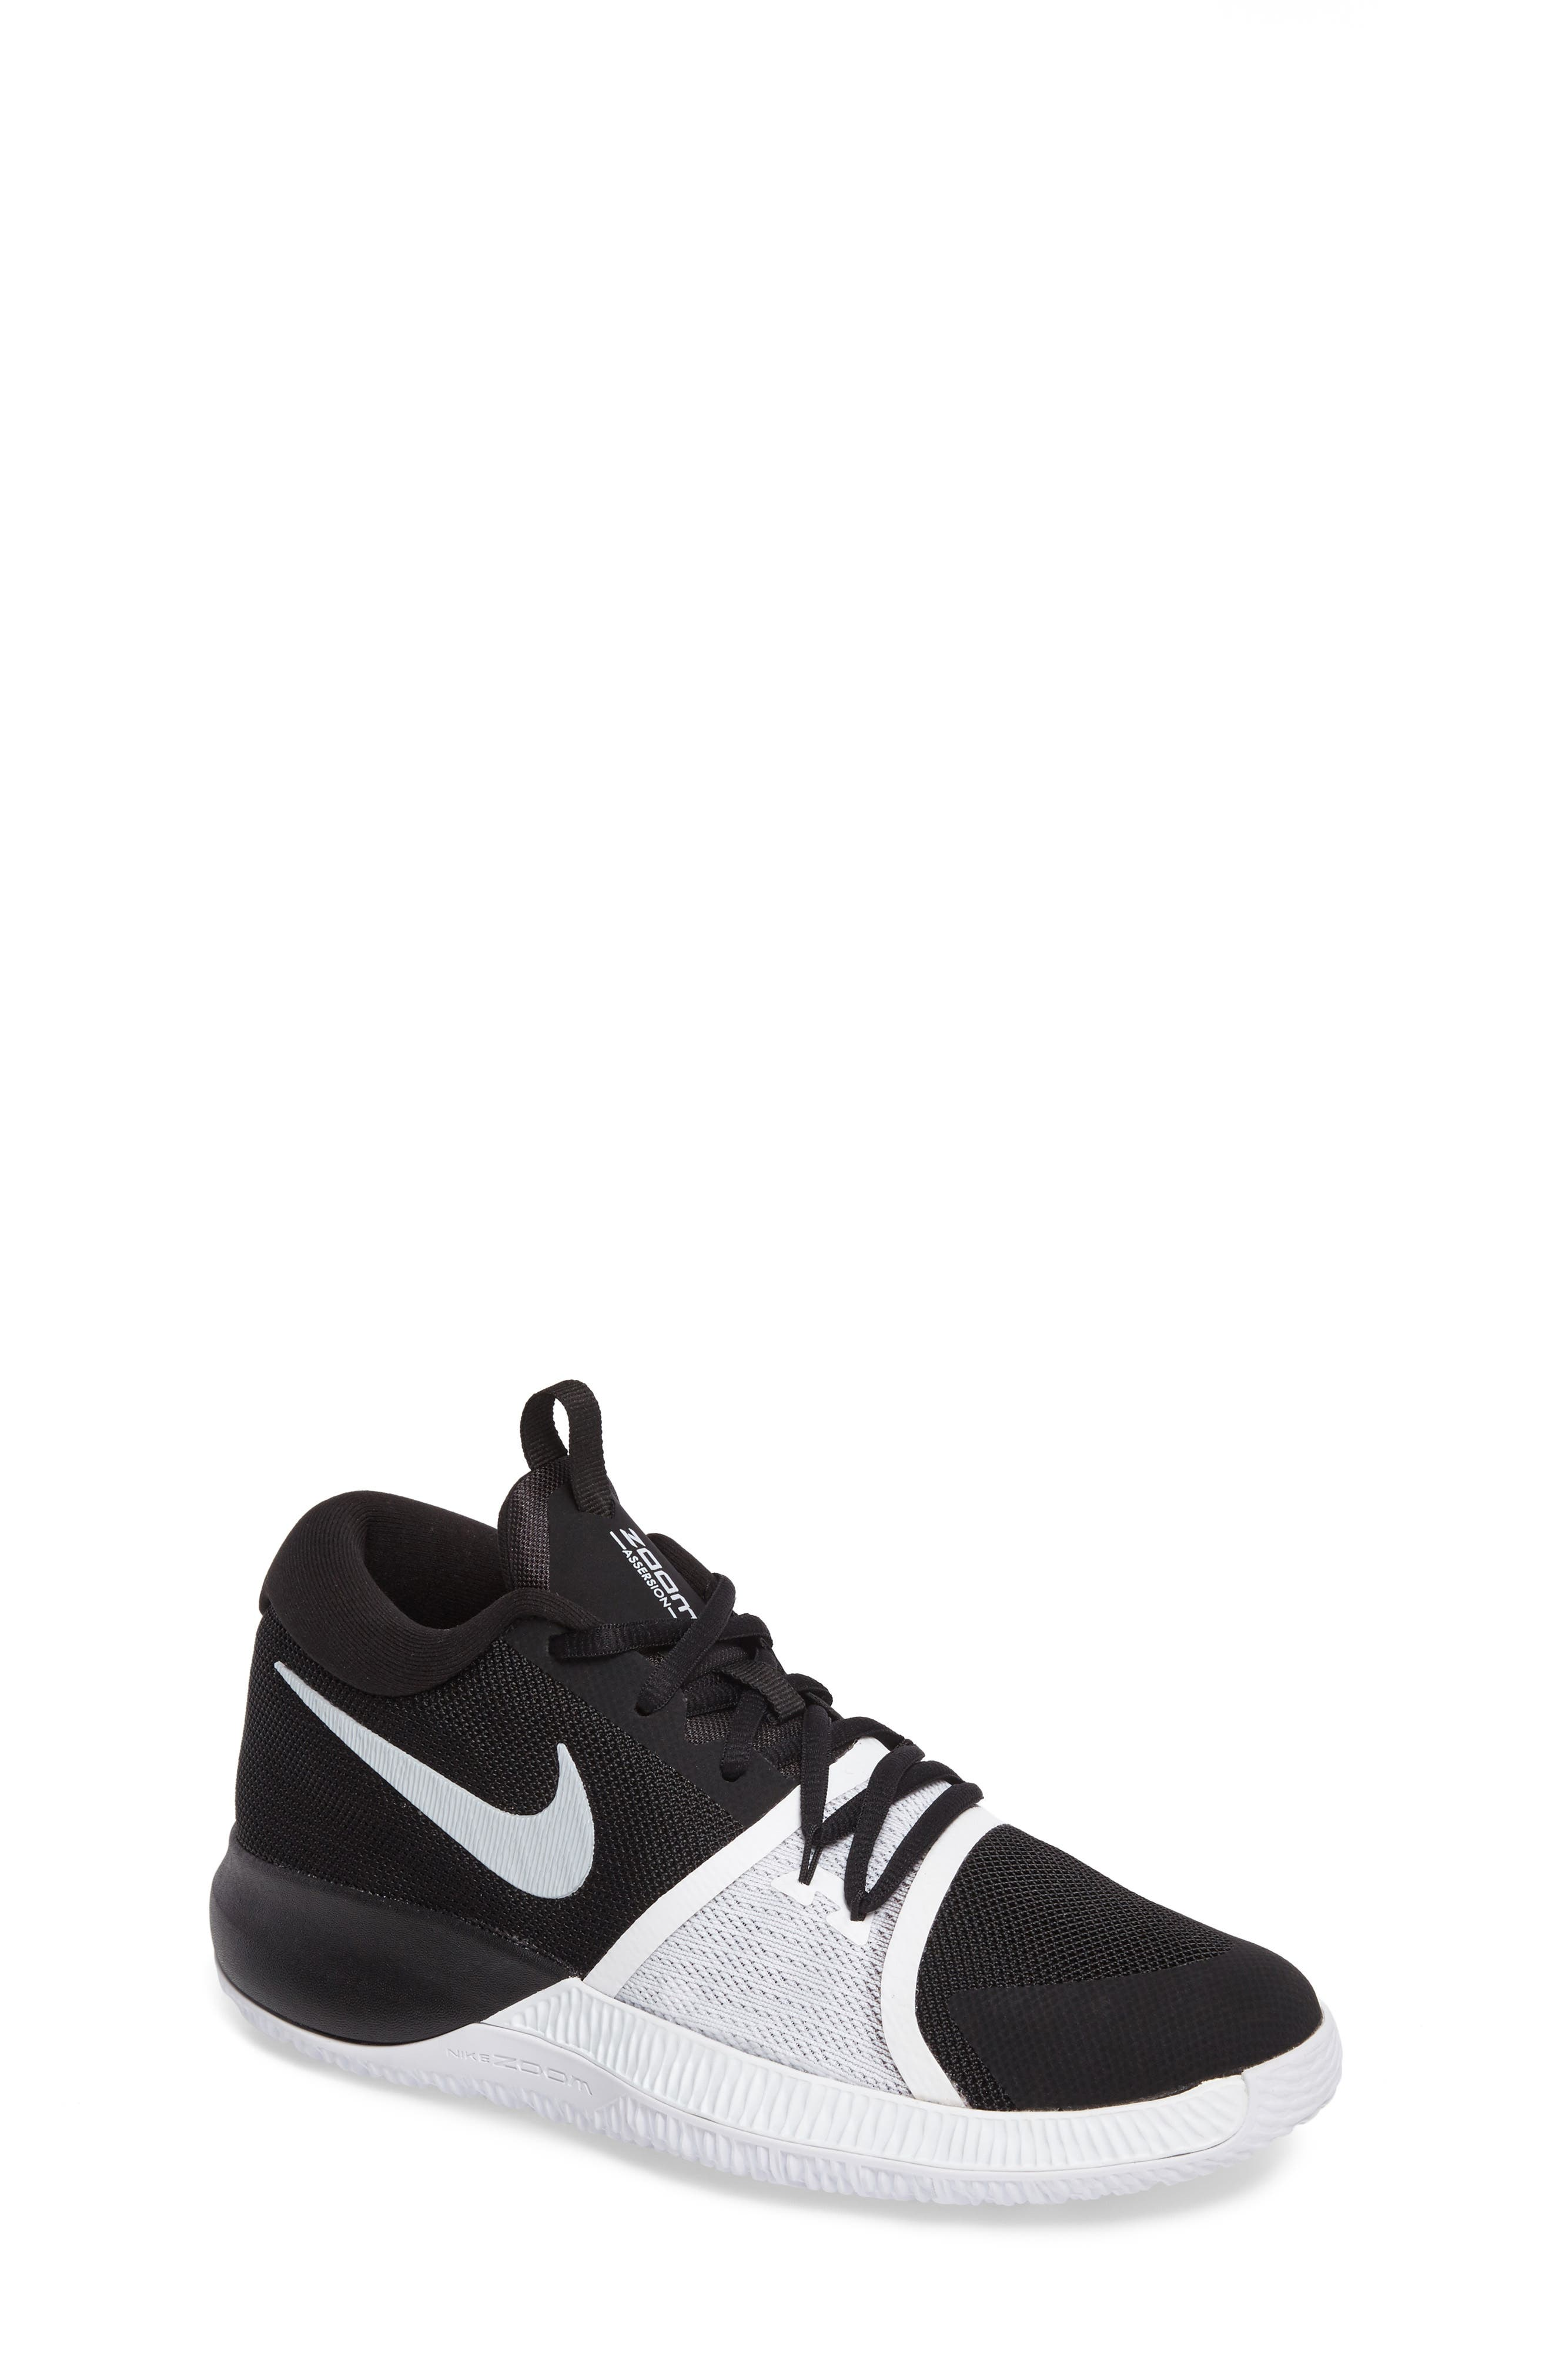 Nike Zoom Assersion Basketball Shoe (Big Kid)